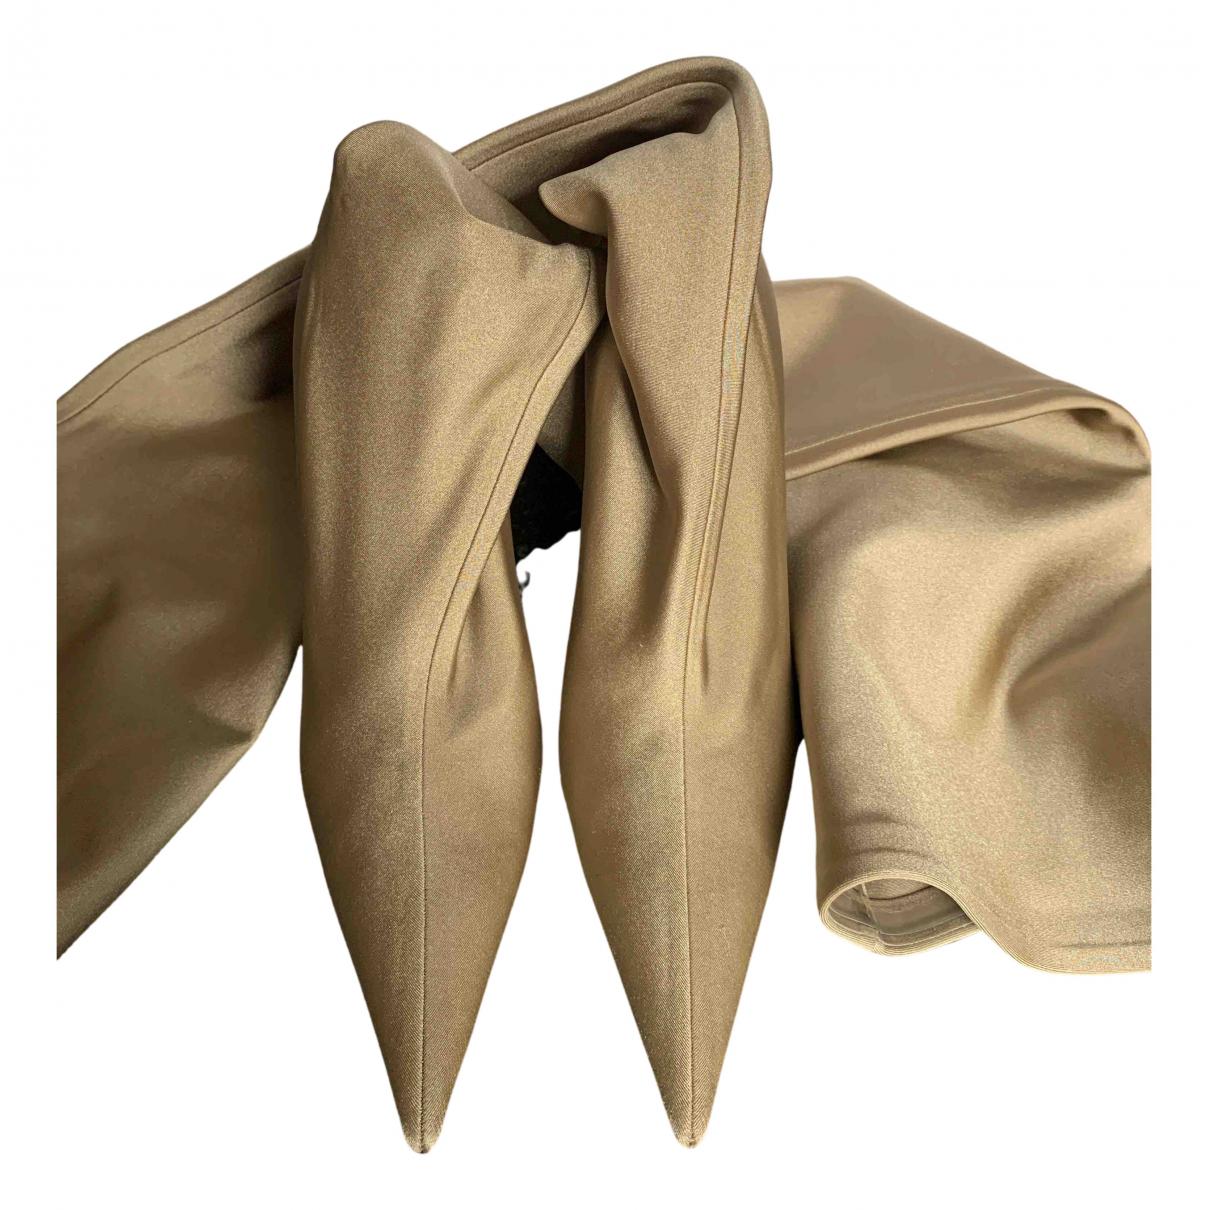 Balenciaga Knife Beige Cloth Boots for Women 39 EU